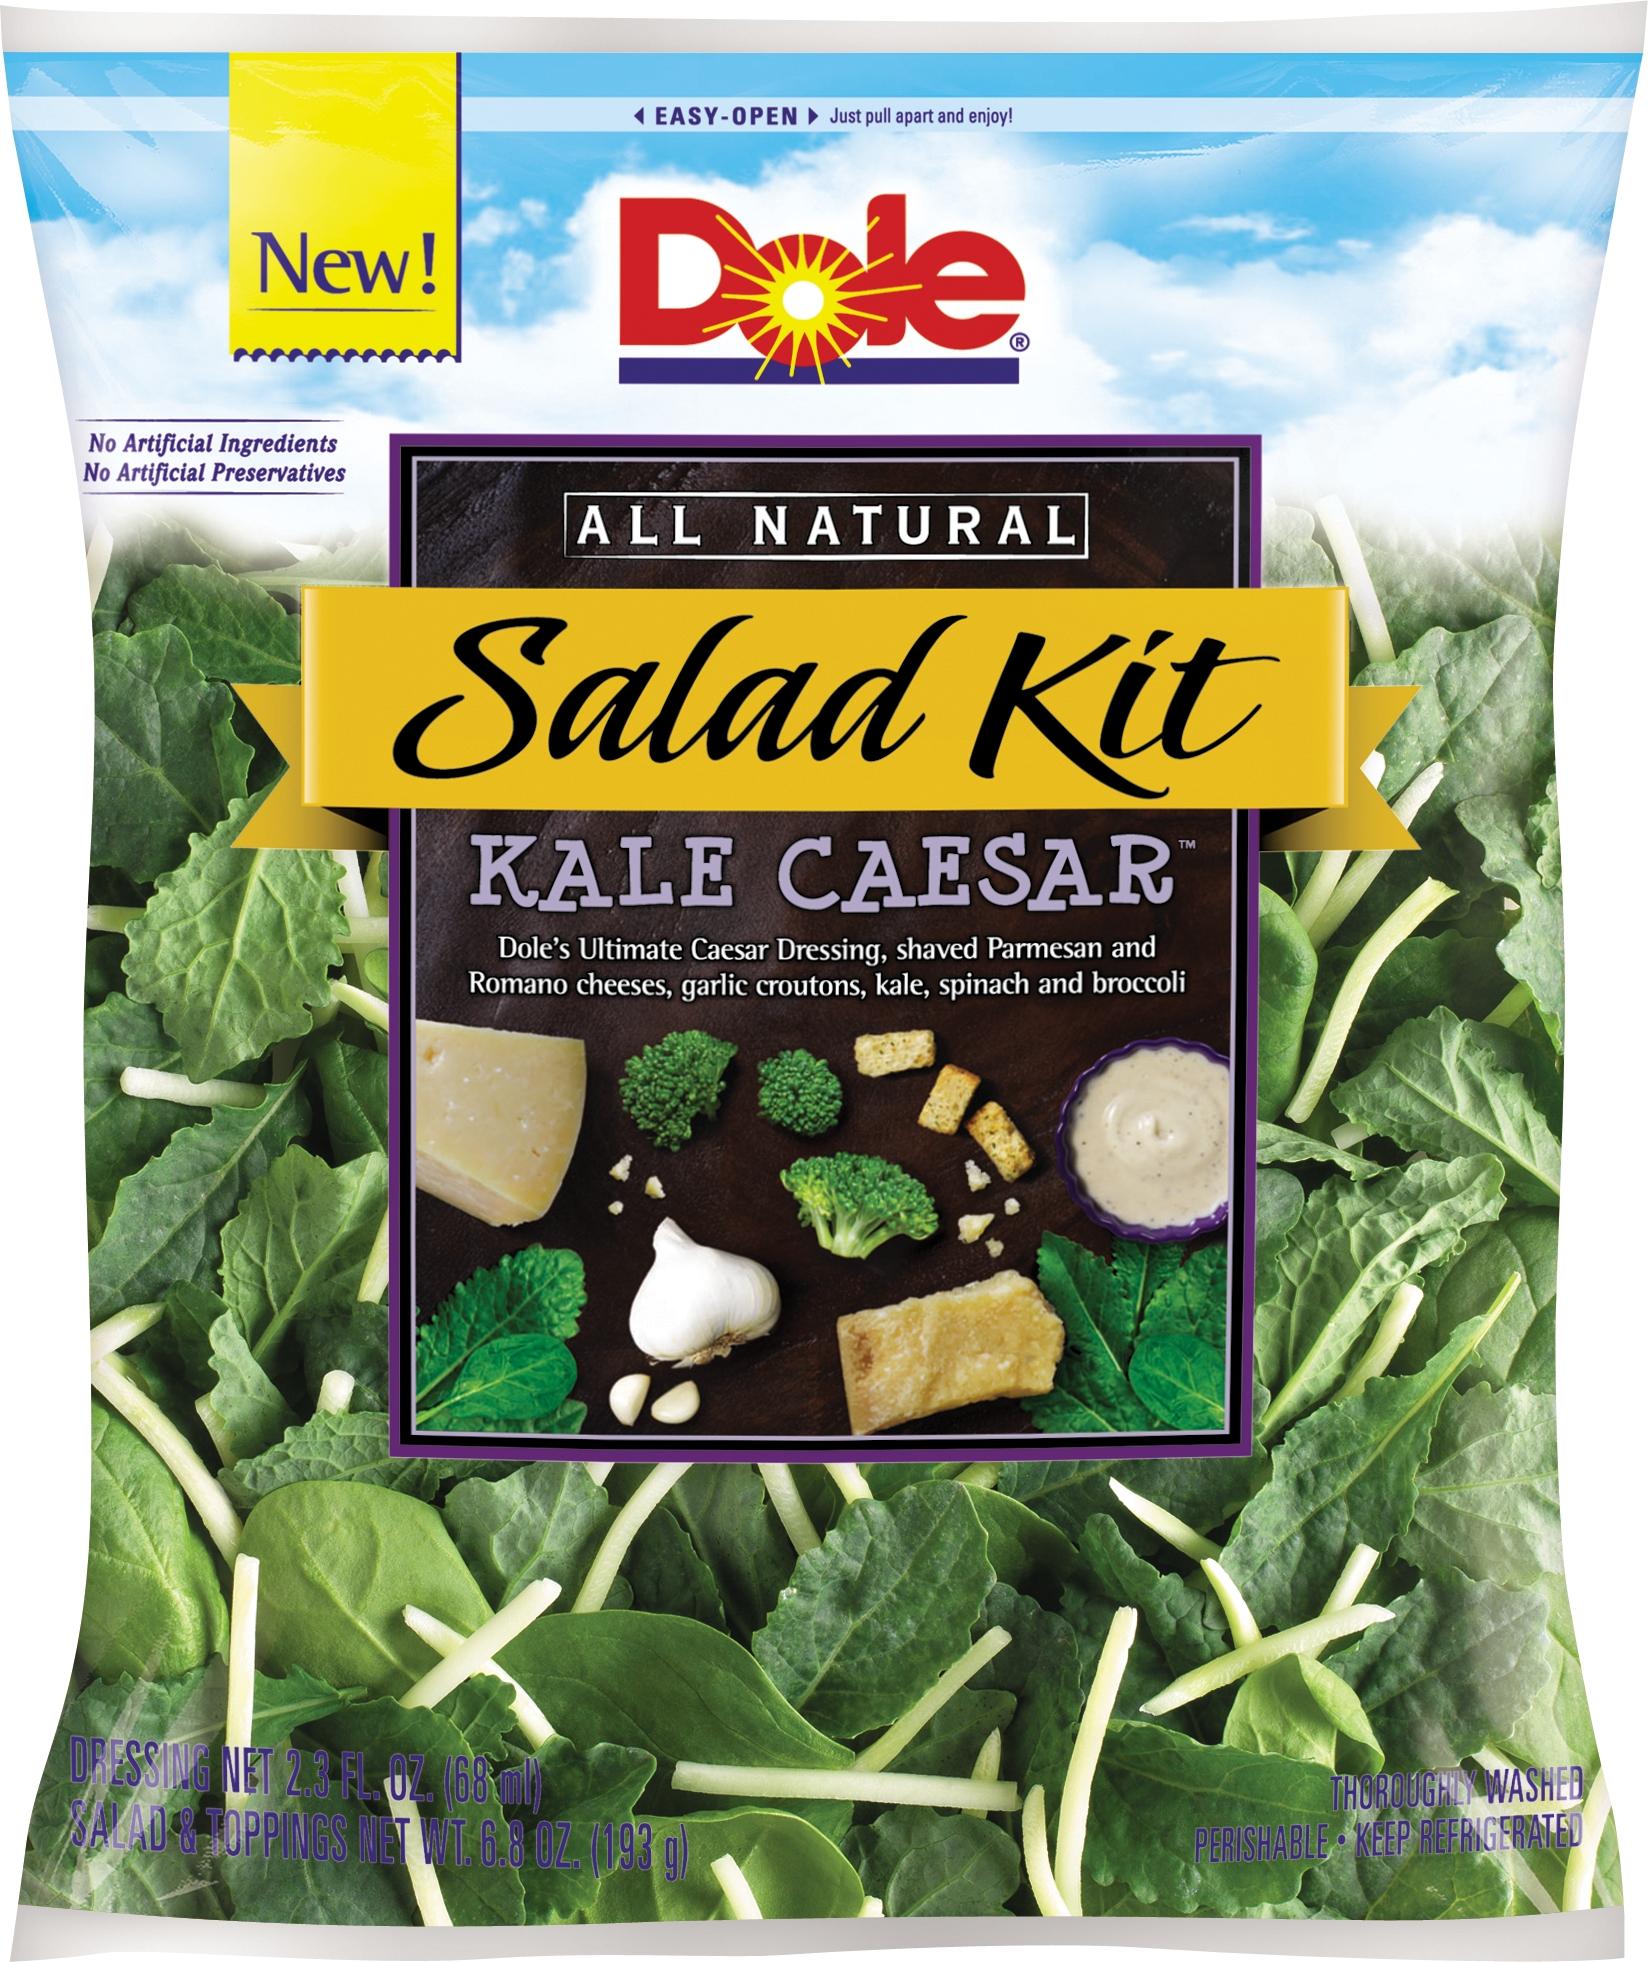 DOLE® Kale Caesar™ Kit combines powerfully nutritious greens with wildly popular Caesar taste. (AP Photo/Dole Fresh Vegetables)